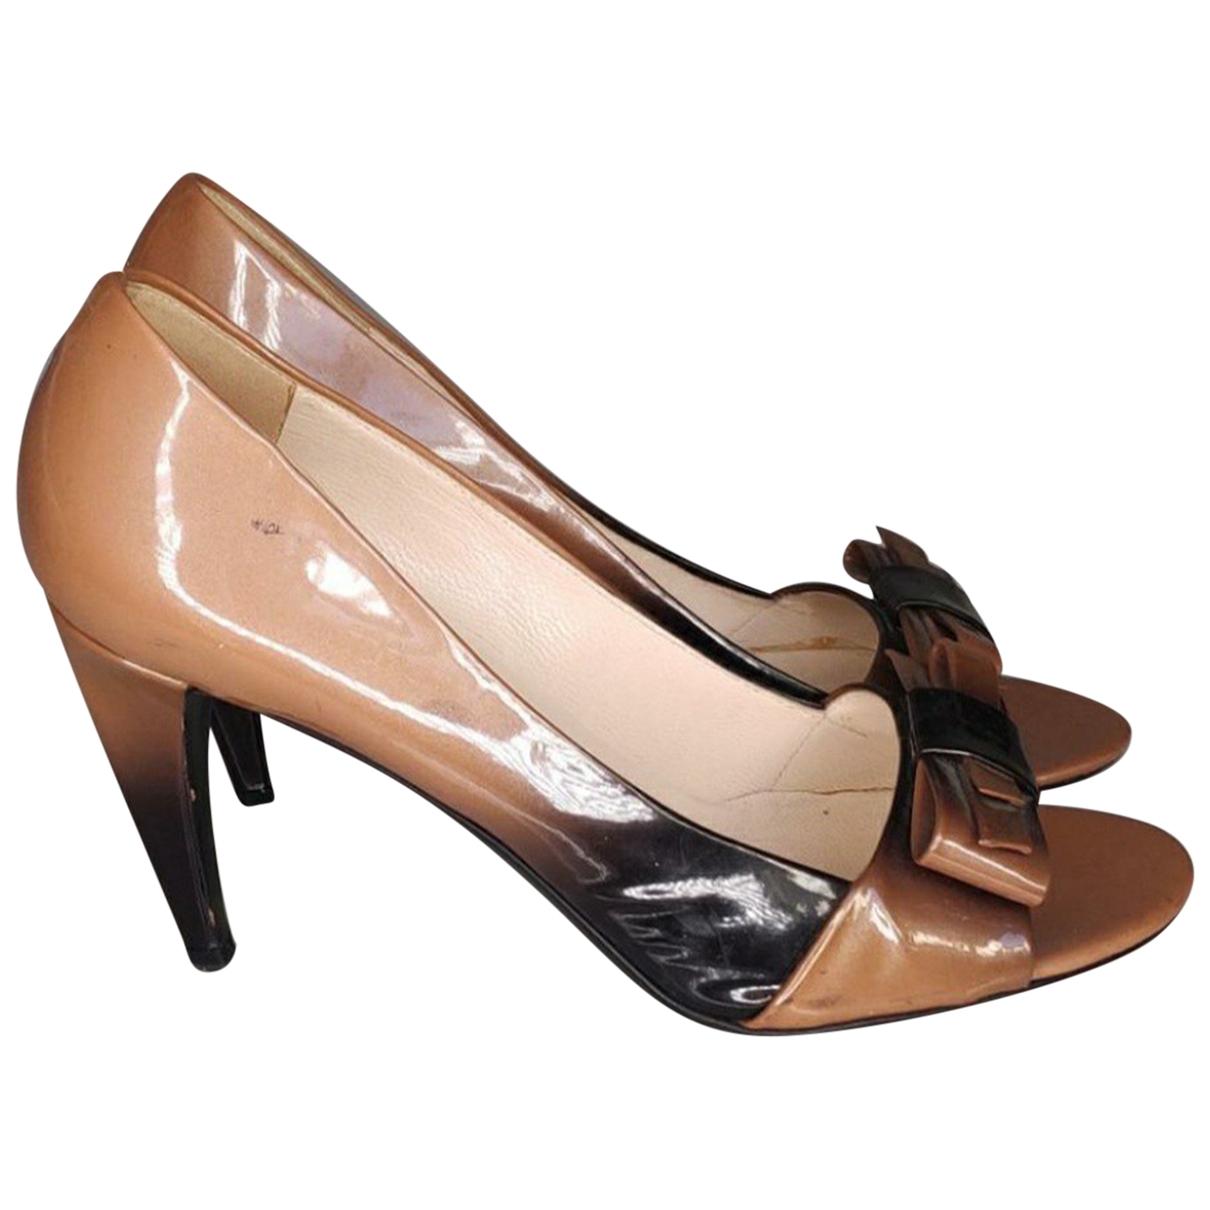 Prada - Escarpins   pour femme en cuir verni - camel